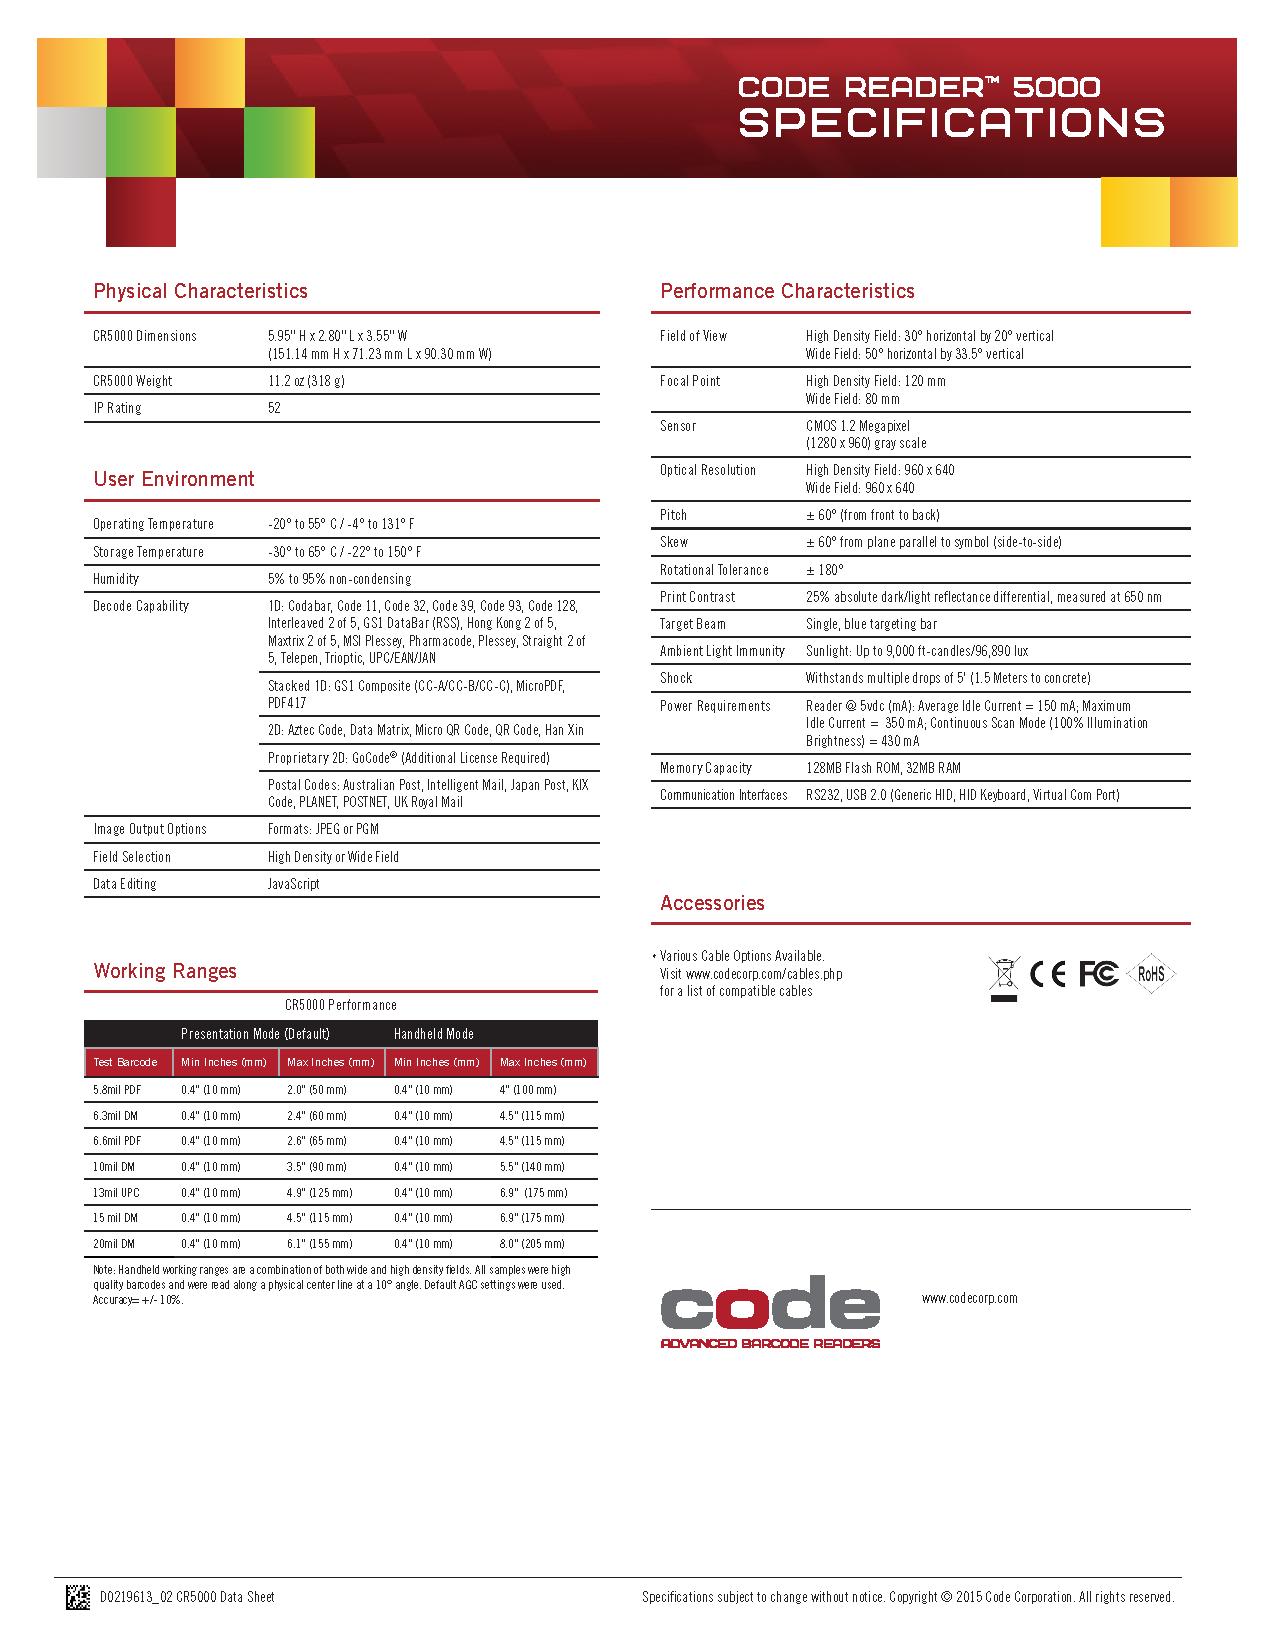 Code CR5000 Desktop Barcode Scanner เครื่องอ่านบาร์โค้ดแบบตั้งโต๊ะ หัวอ่าน 2 มิติ Data Sheet